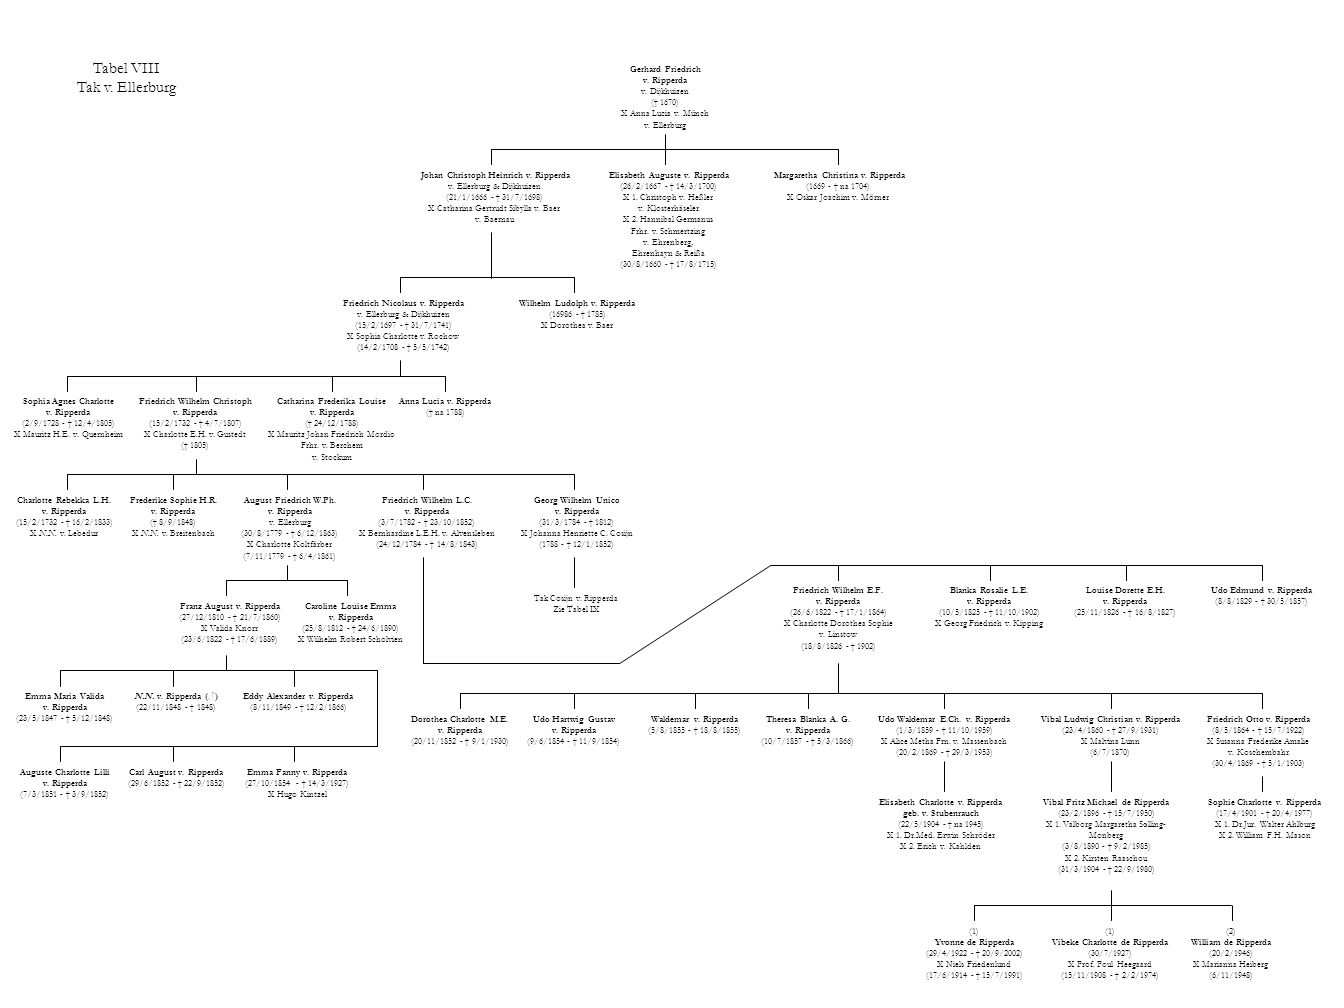 Tabel VIII Tak v. Ellerburg Gerhard Friedrich v. Ripperda